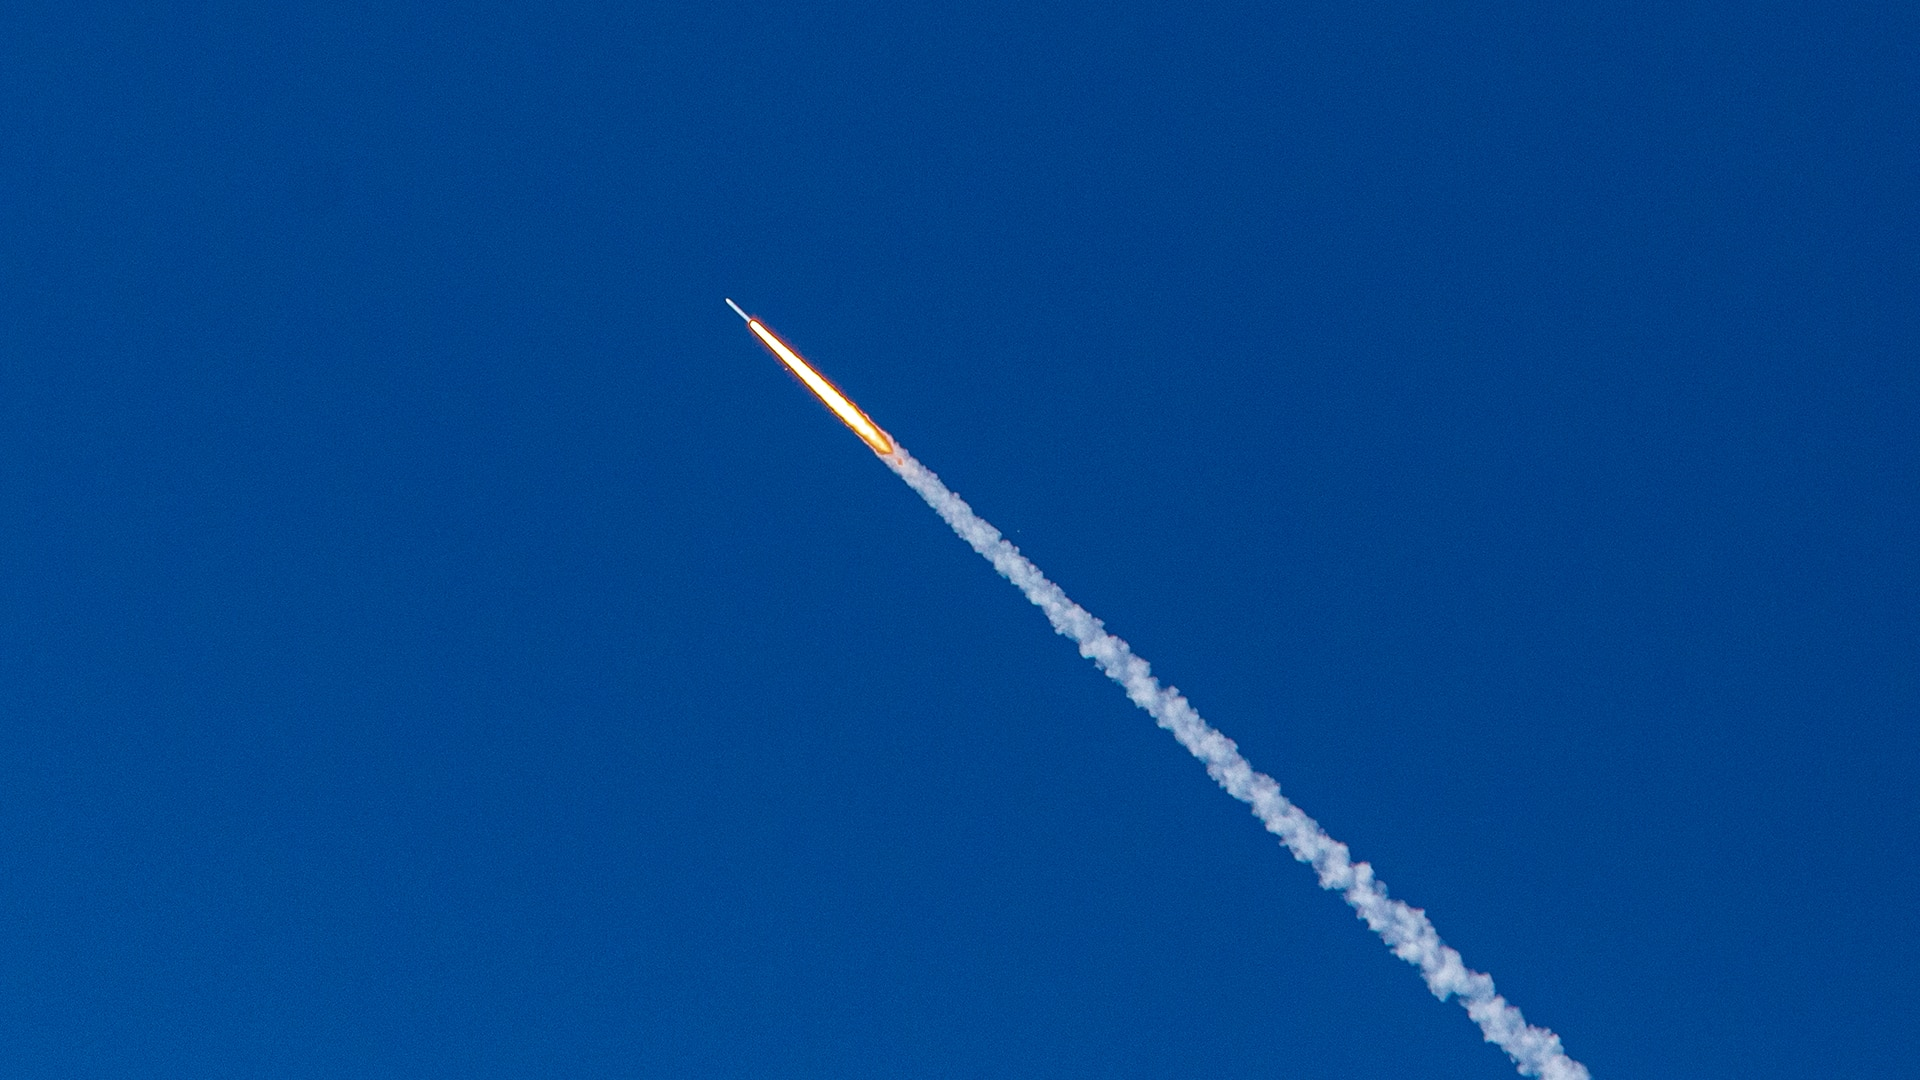 Space rocket in the sky